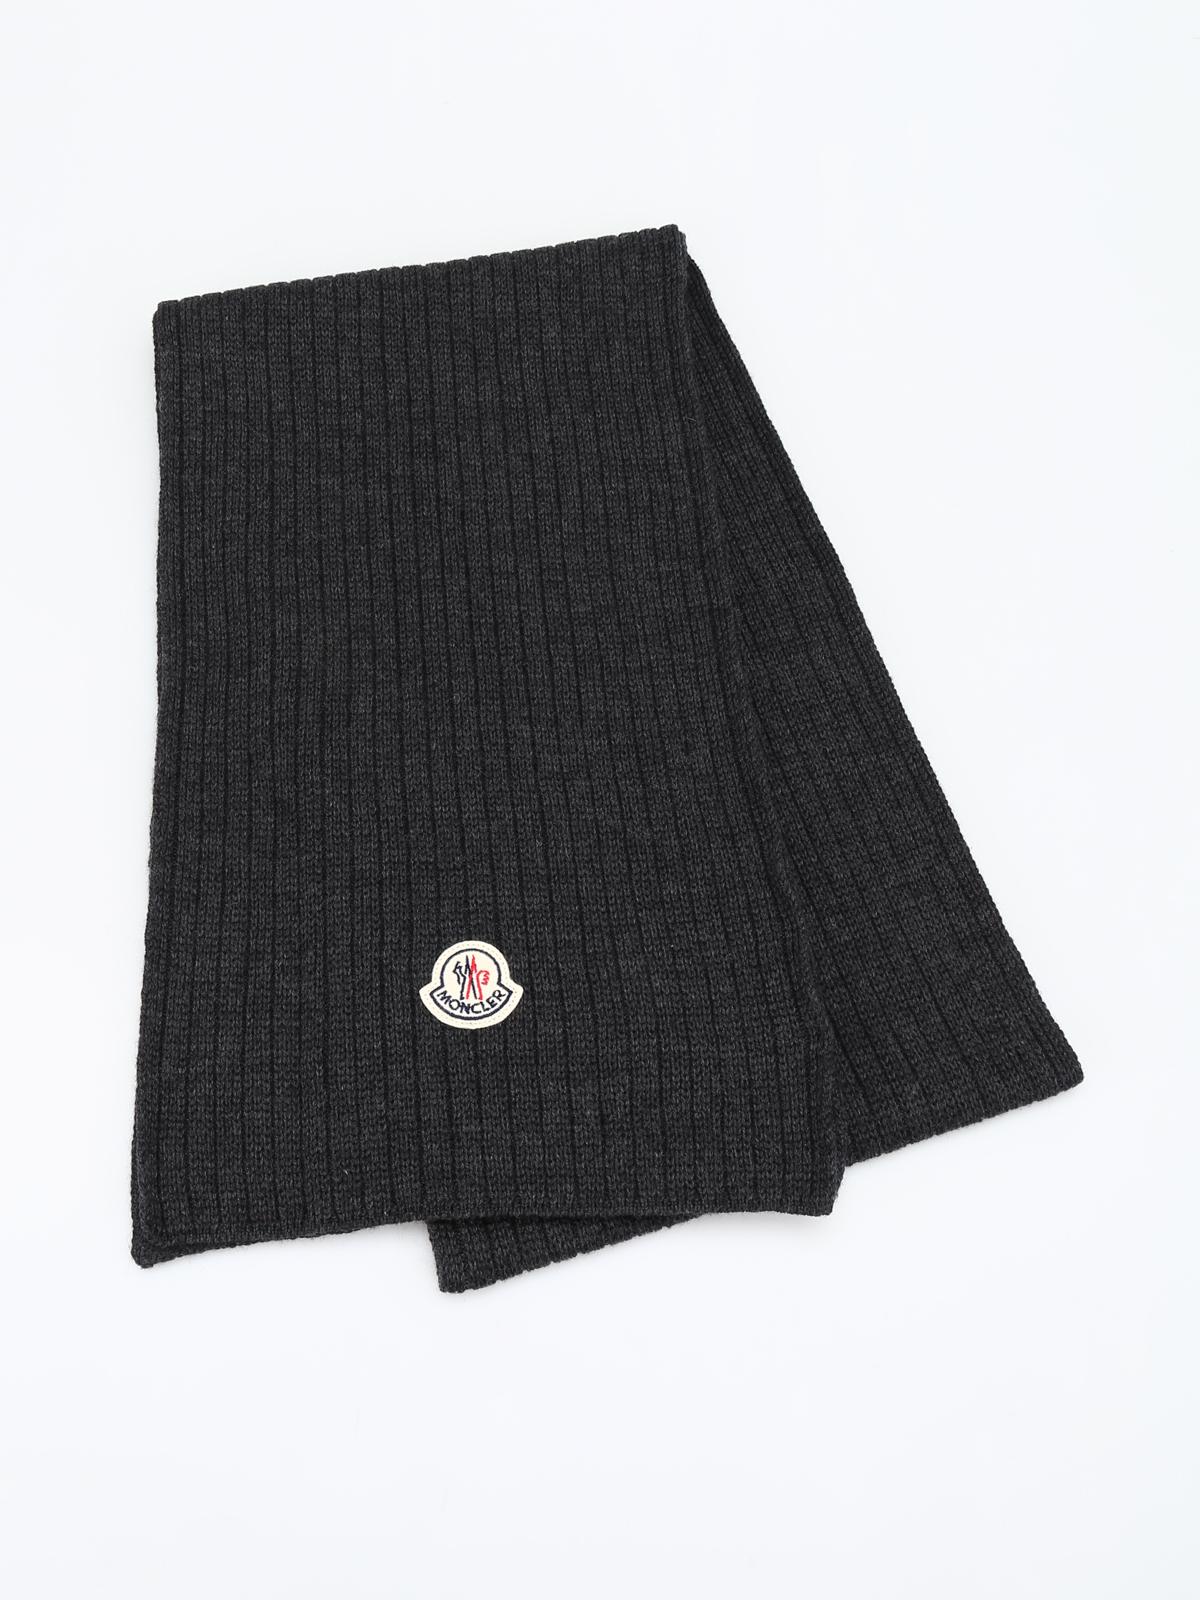 moncler grey scarf